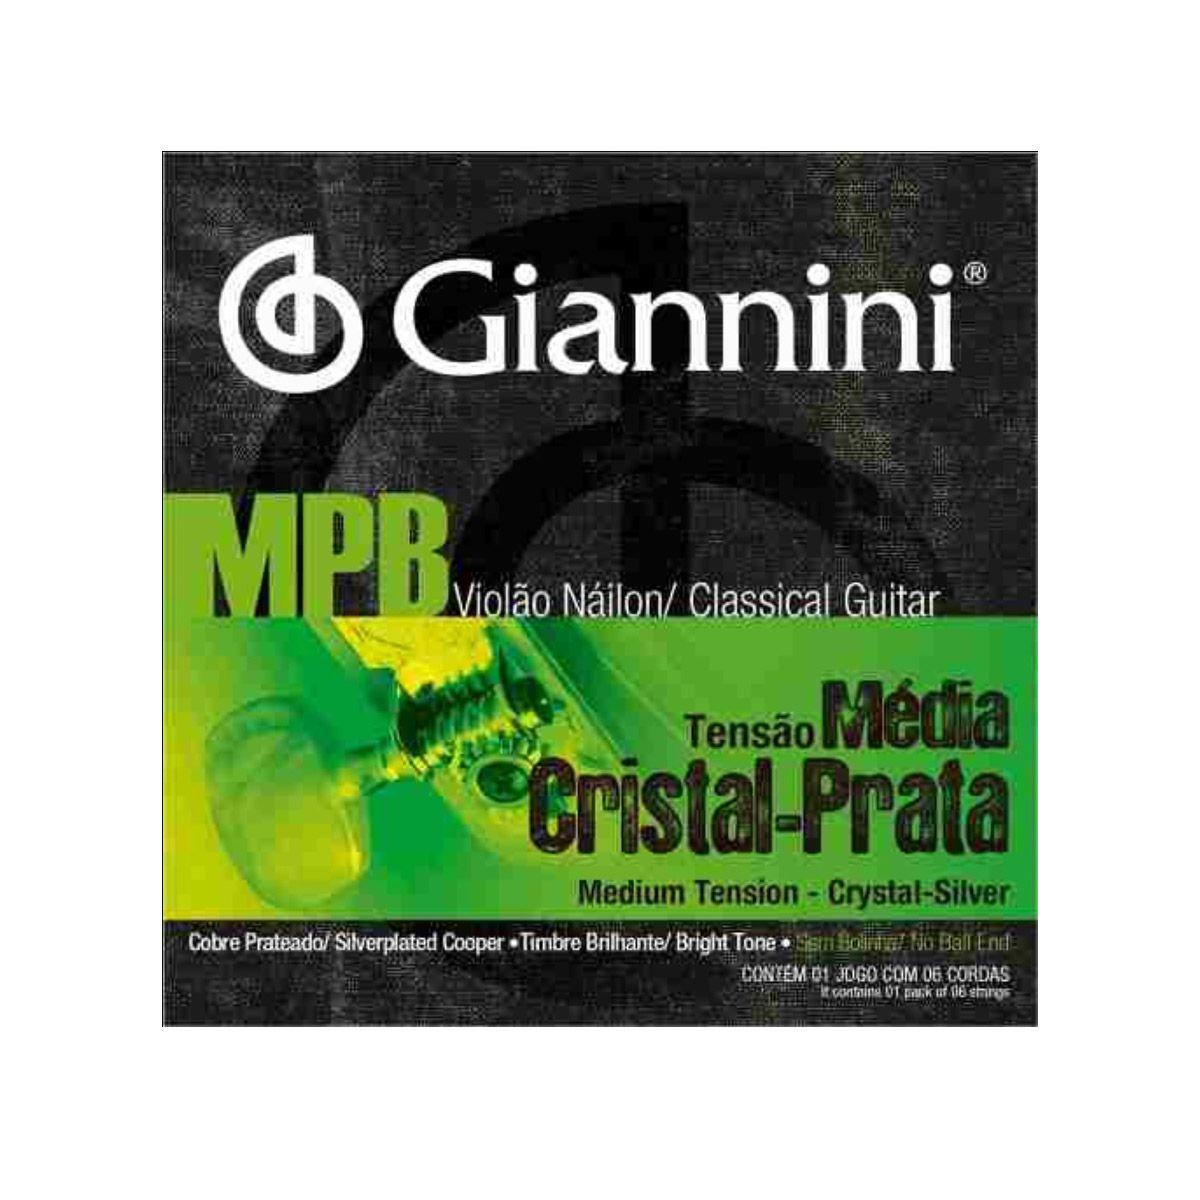 Encordoamento Giannini Genws .028/.043 MPB para Violão Nylon